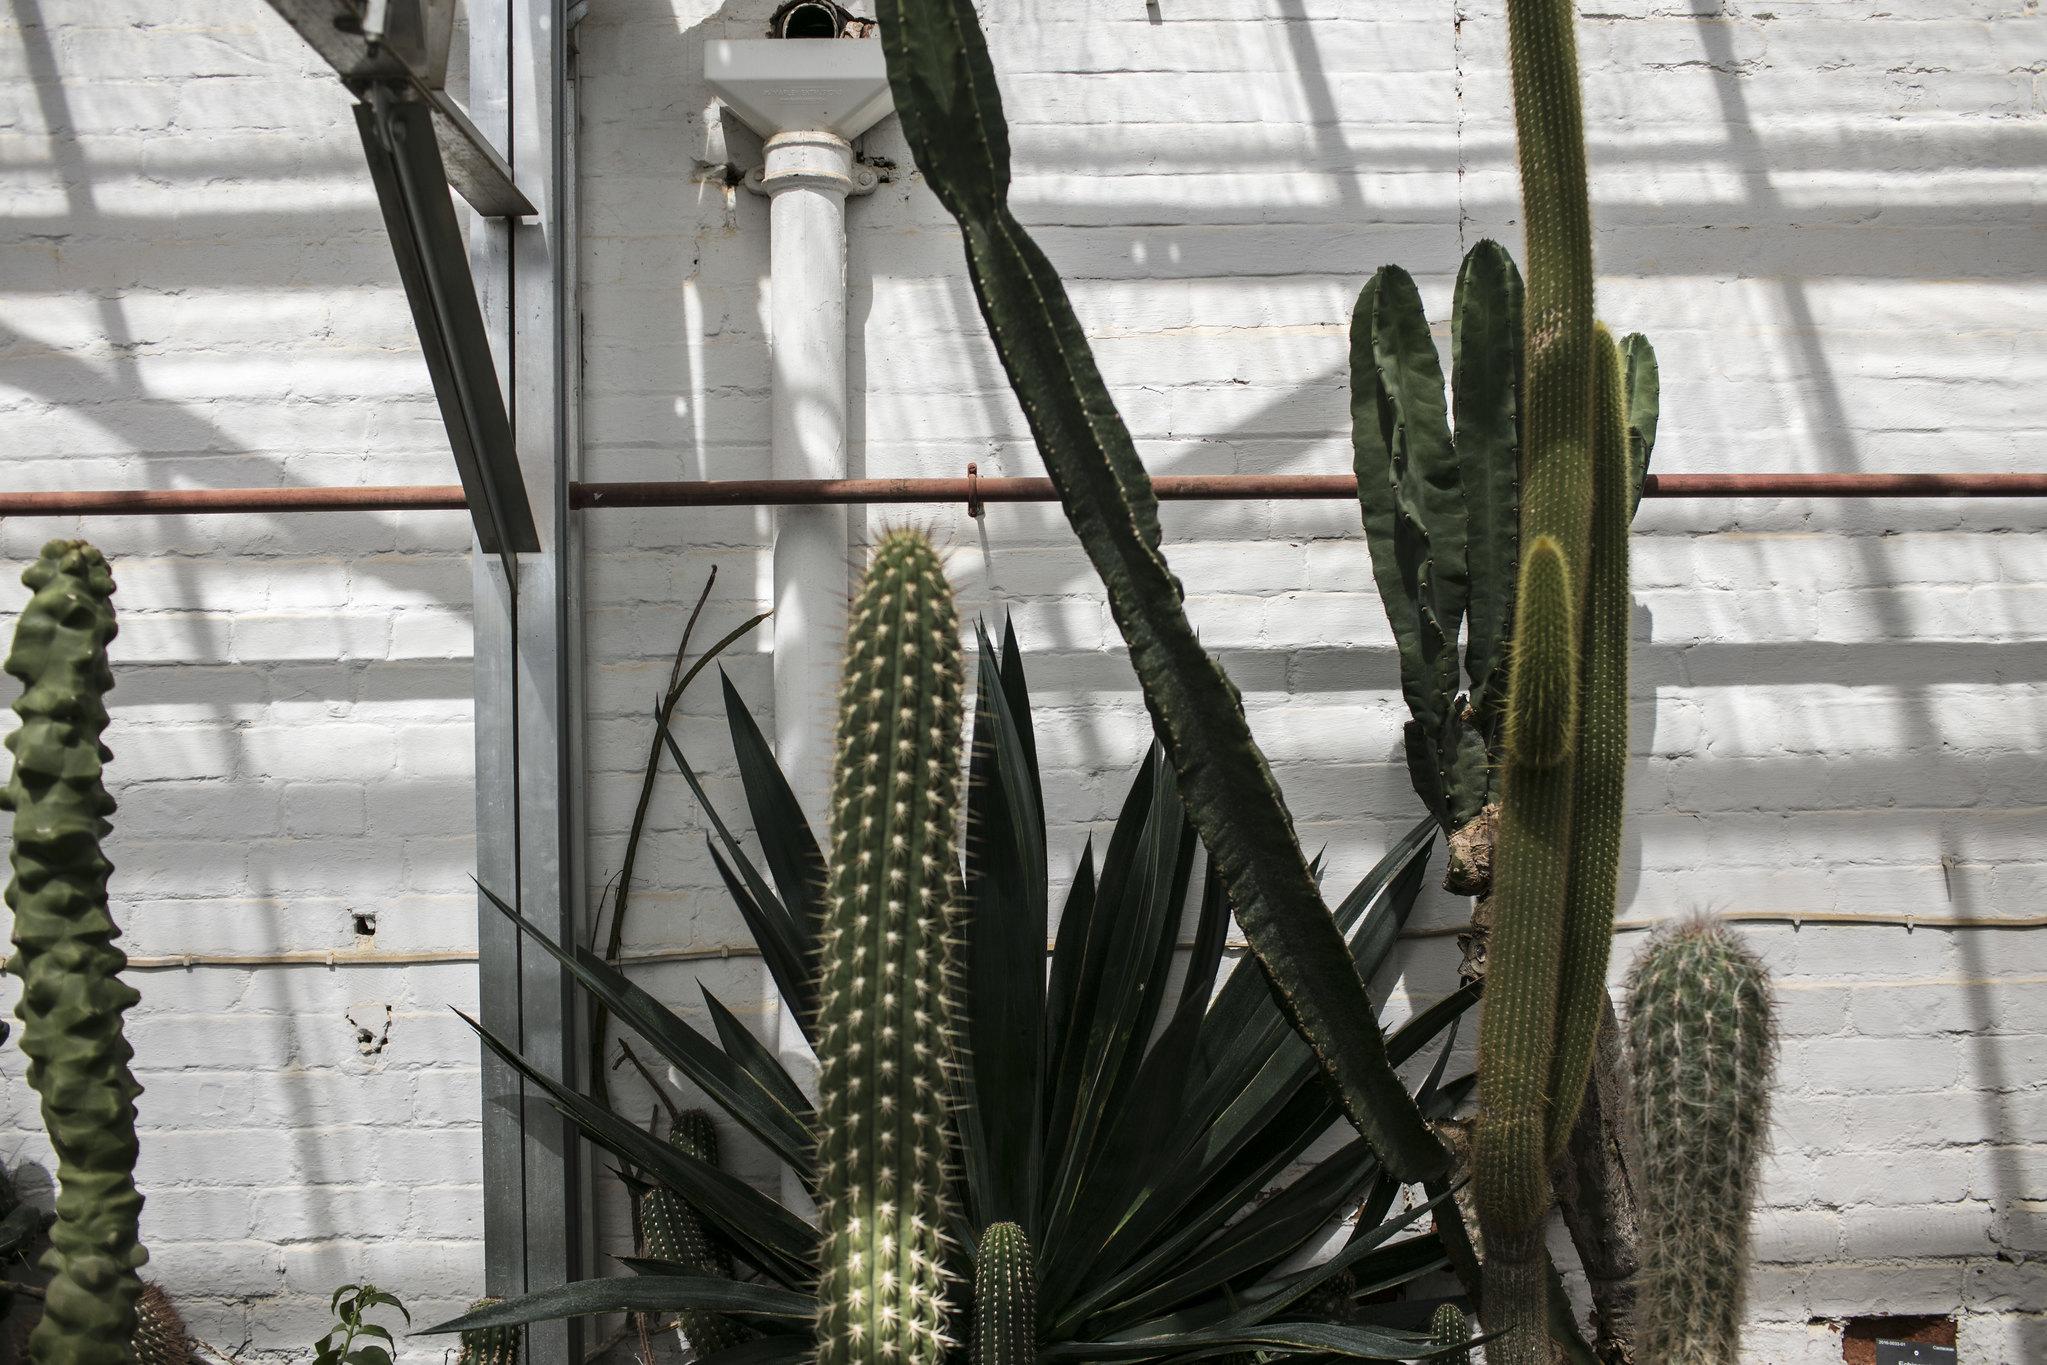 Jordan_Bunker_botanical_gardens_5